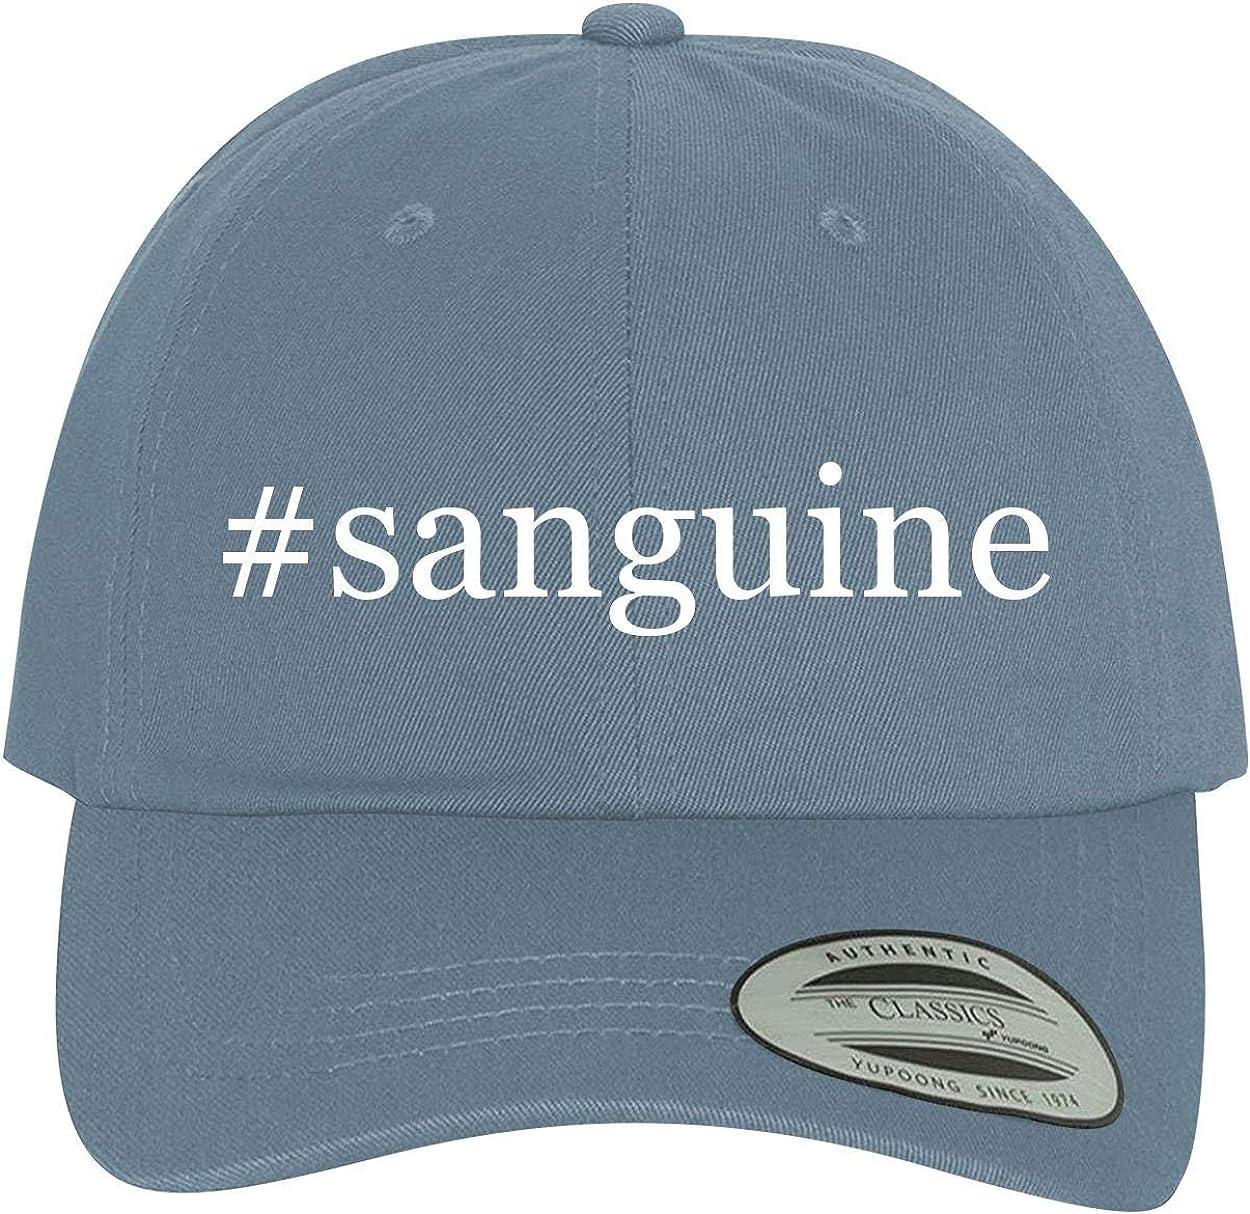 Comfortable Dad Hat Baseball Cap BH Cool Designs #Sanguine